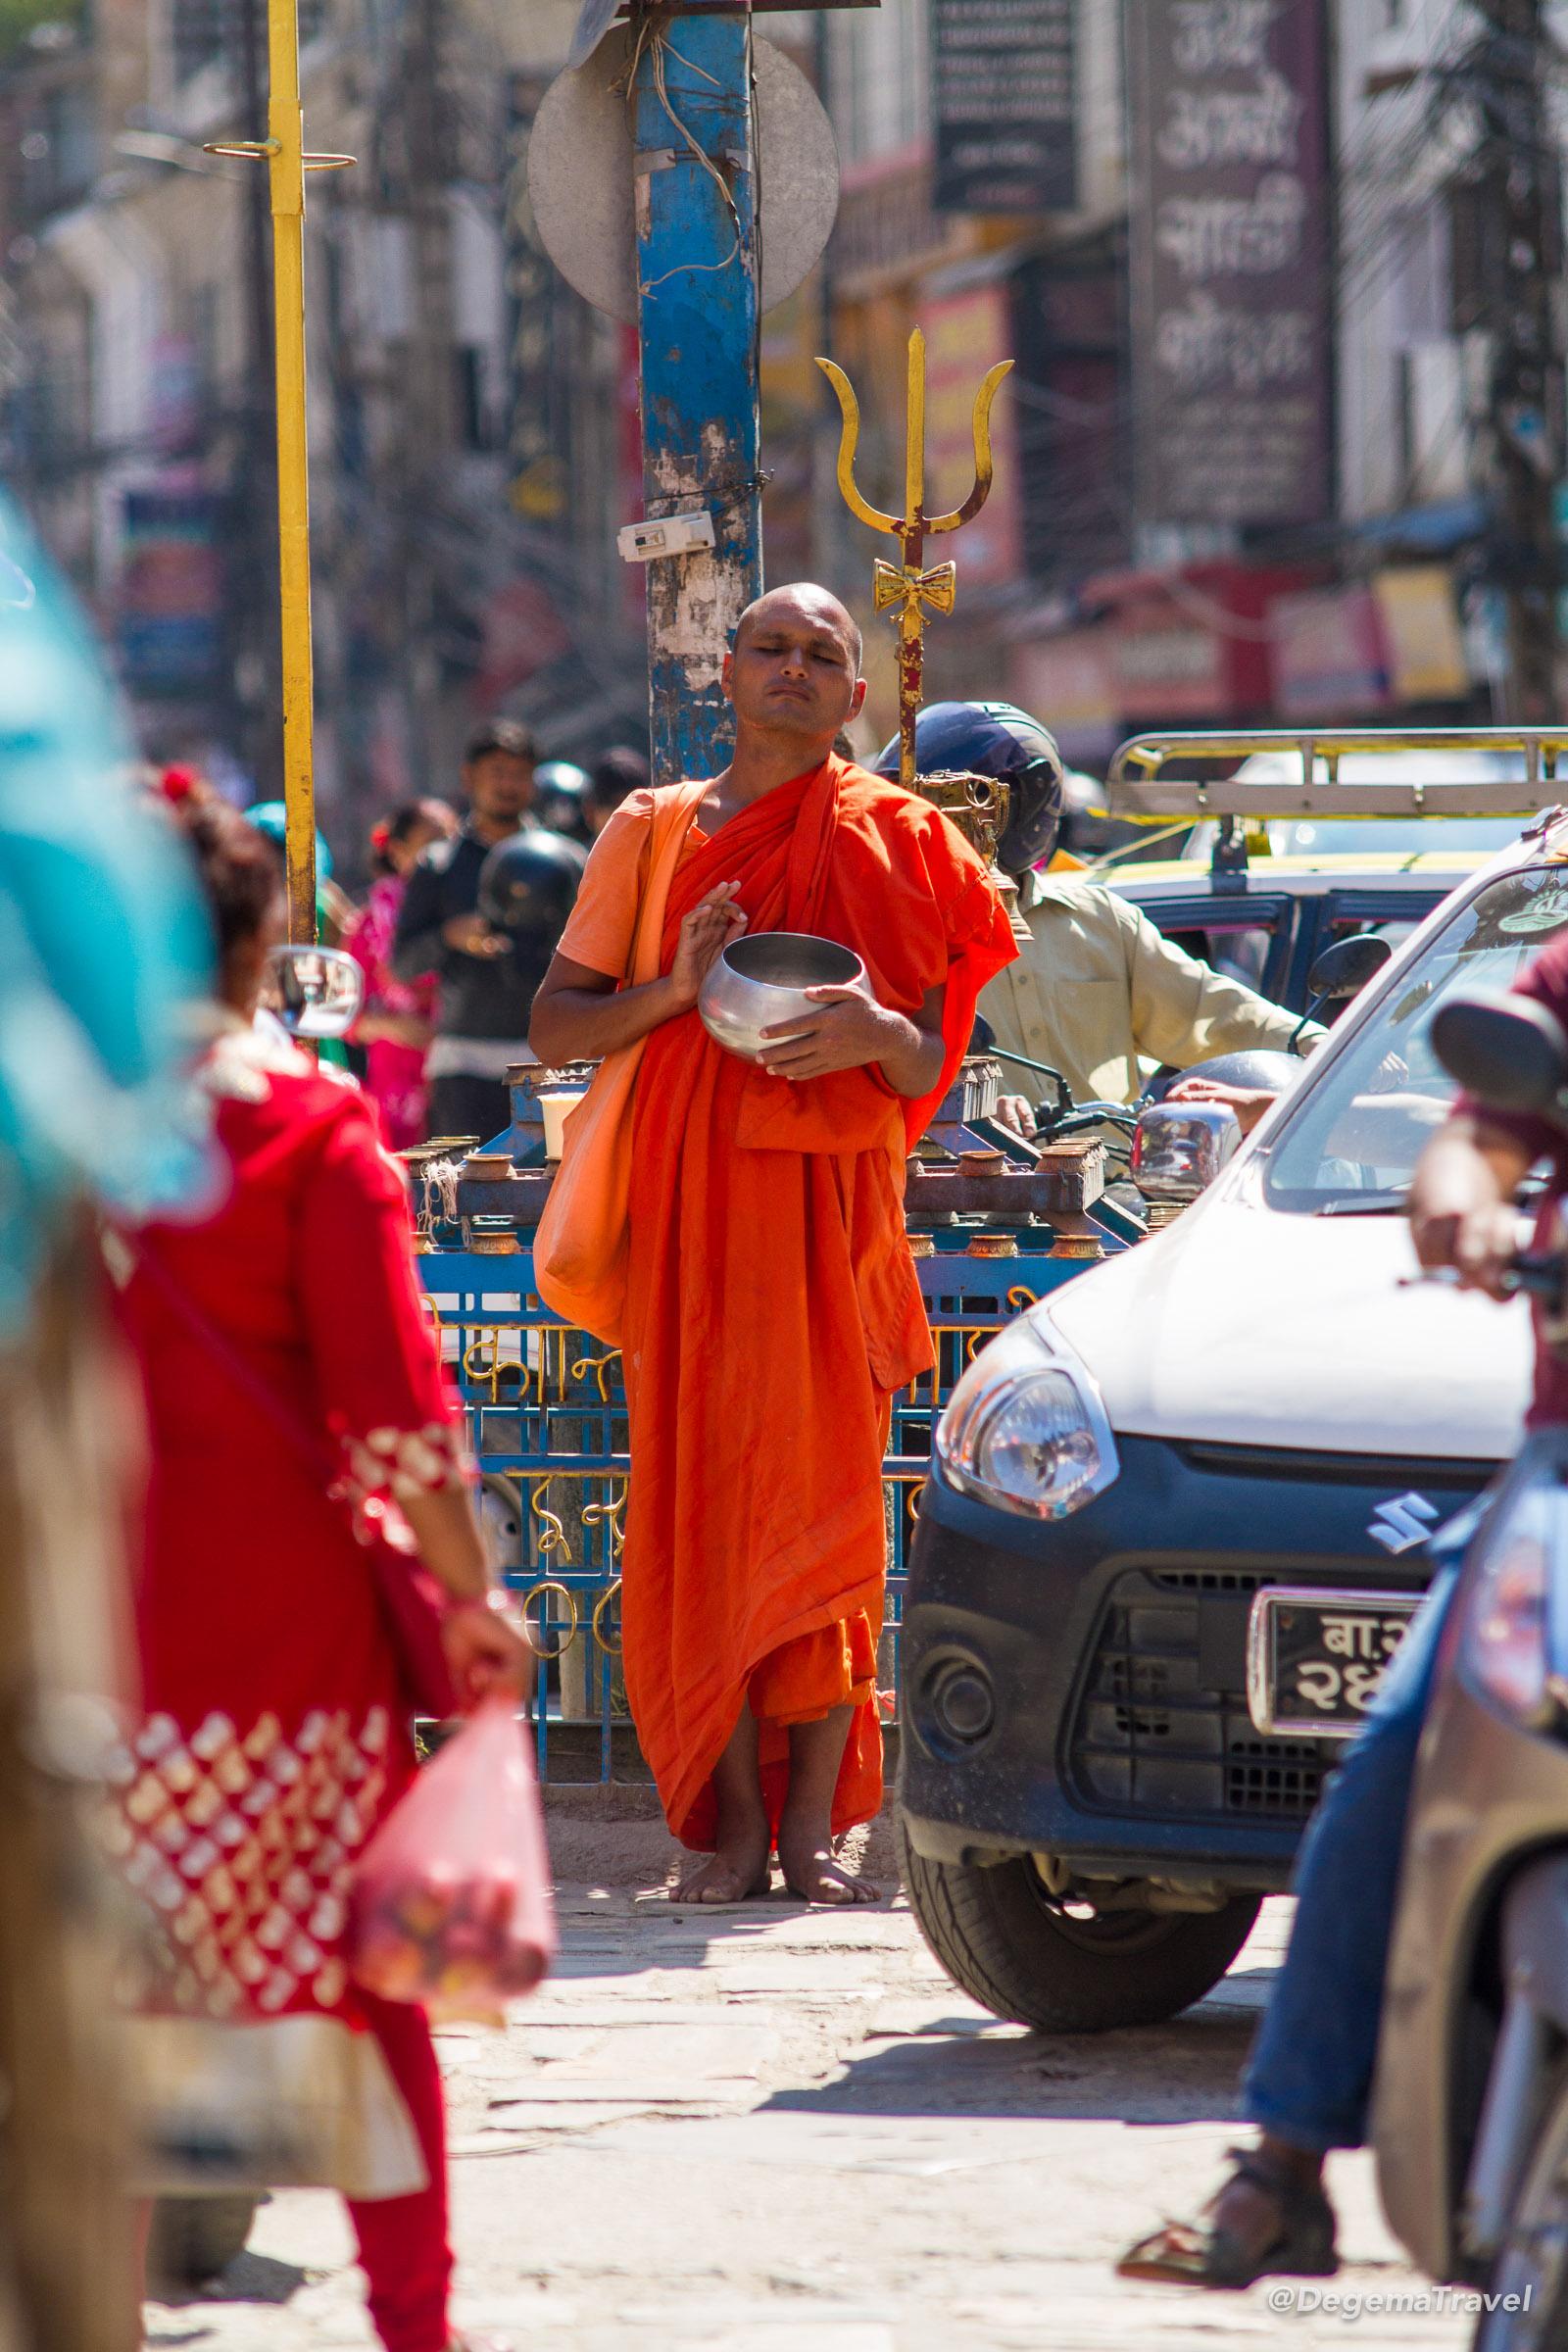 A Buddhist monk in Thamel, Kathmandu, Nepal